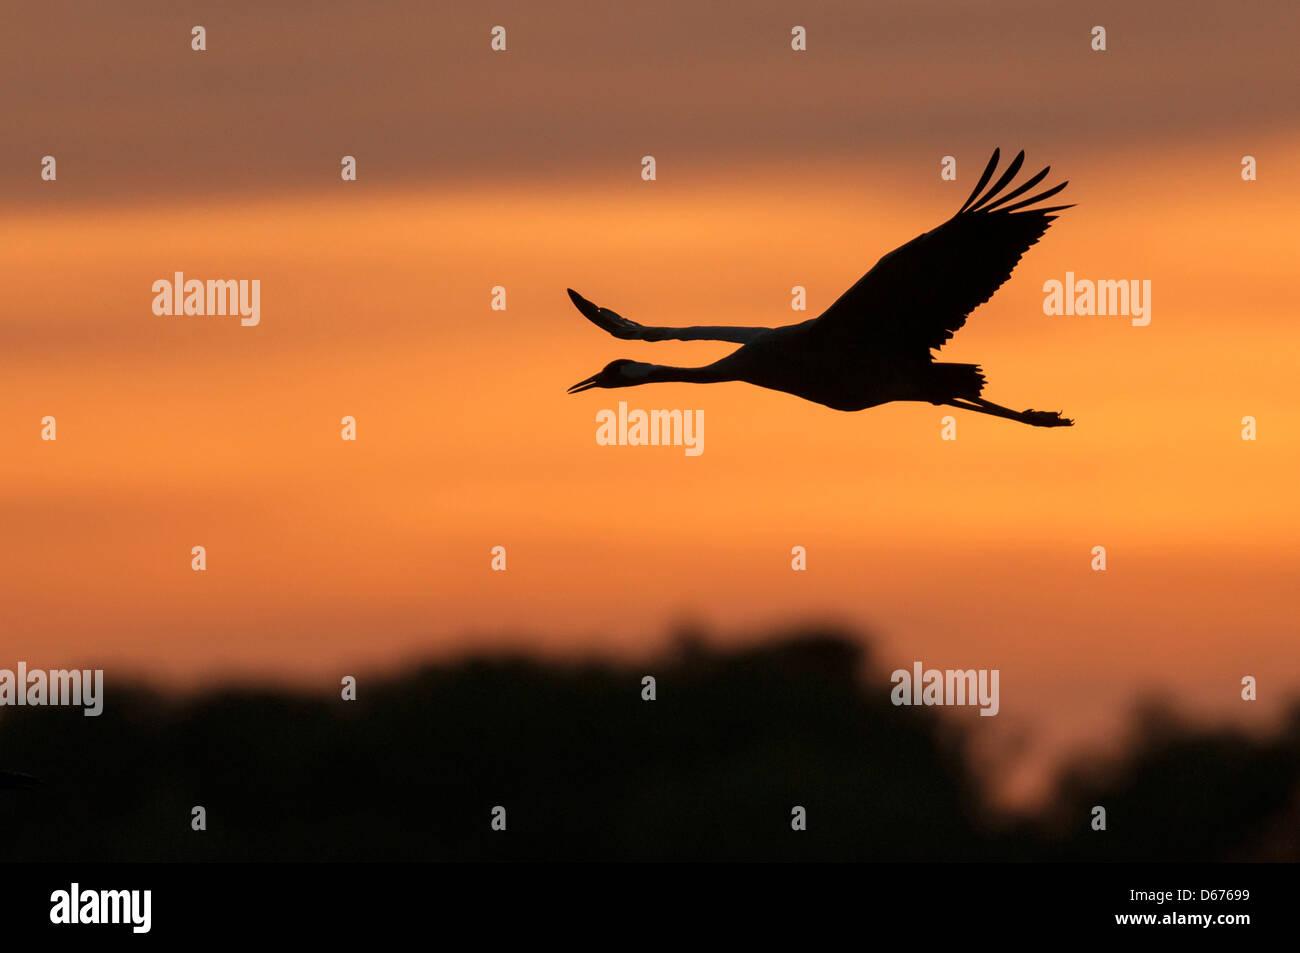 Kran am Himmel, Grus Grus, Deutschland Stockbild